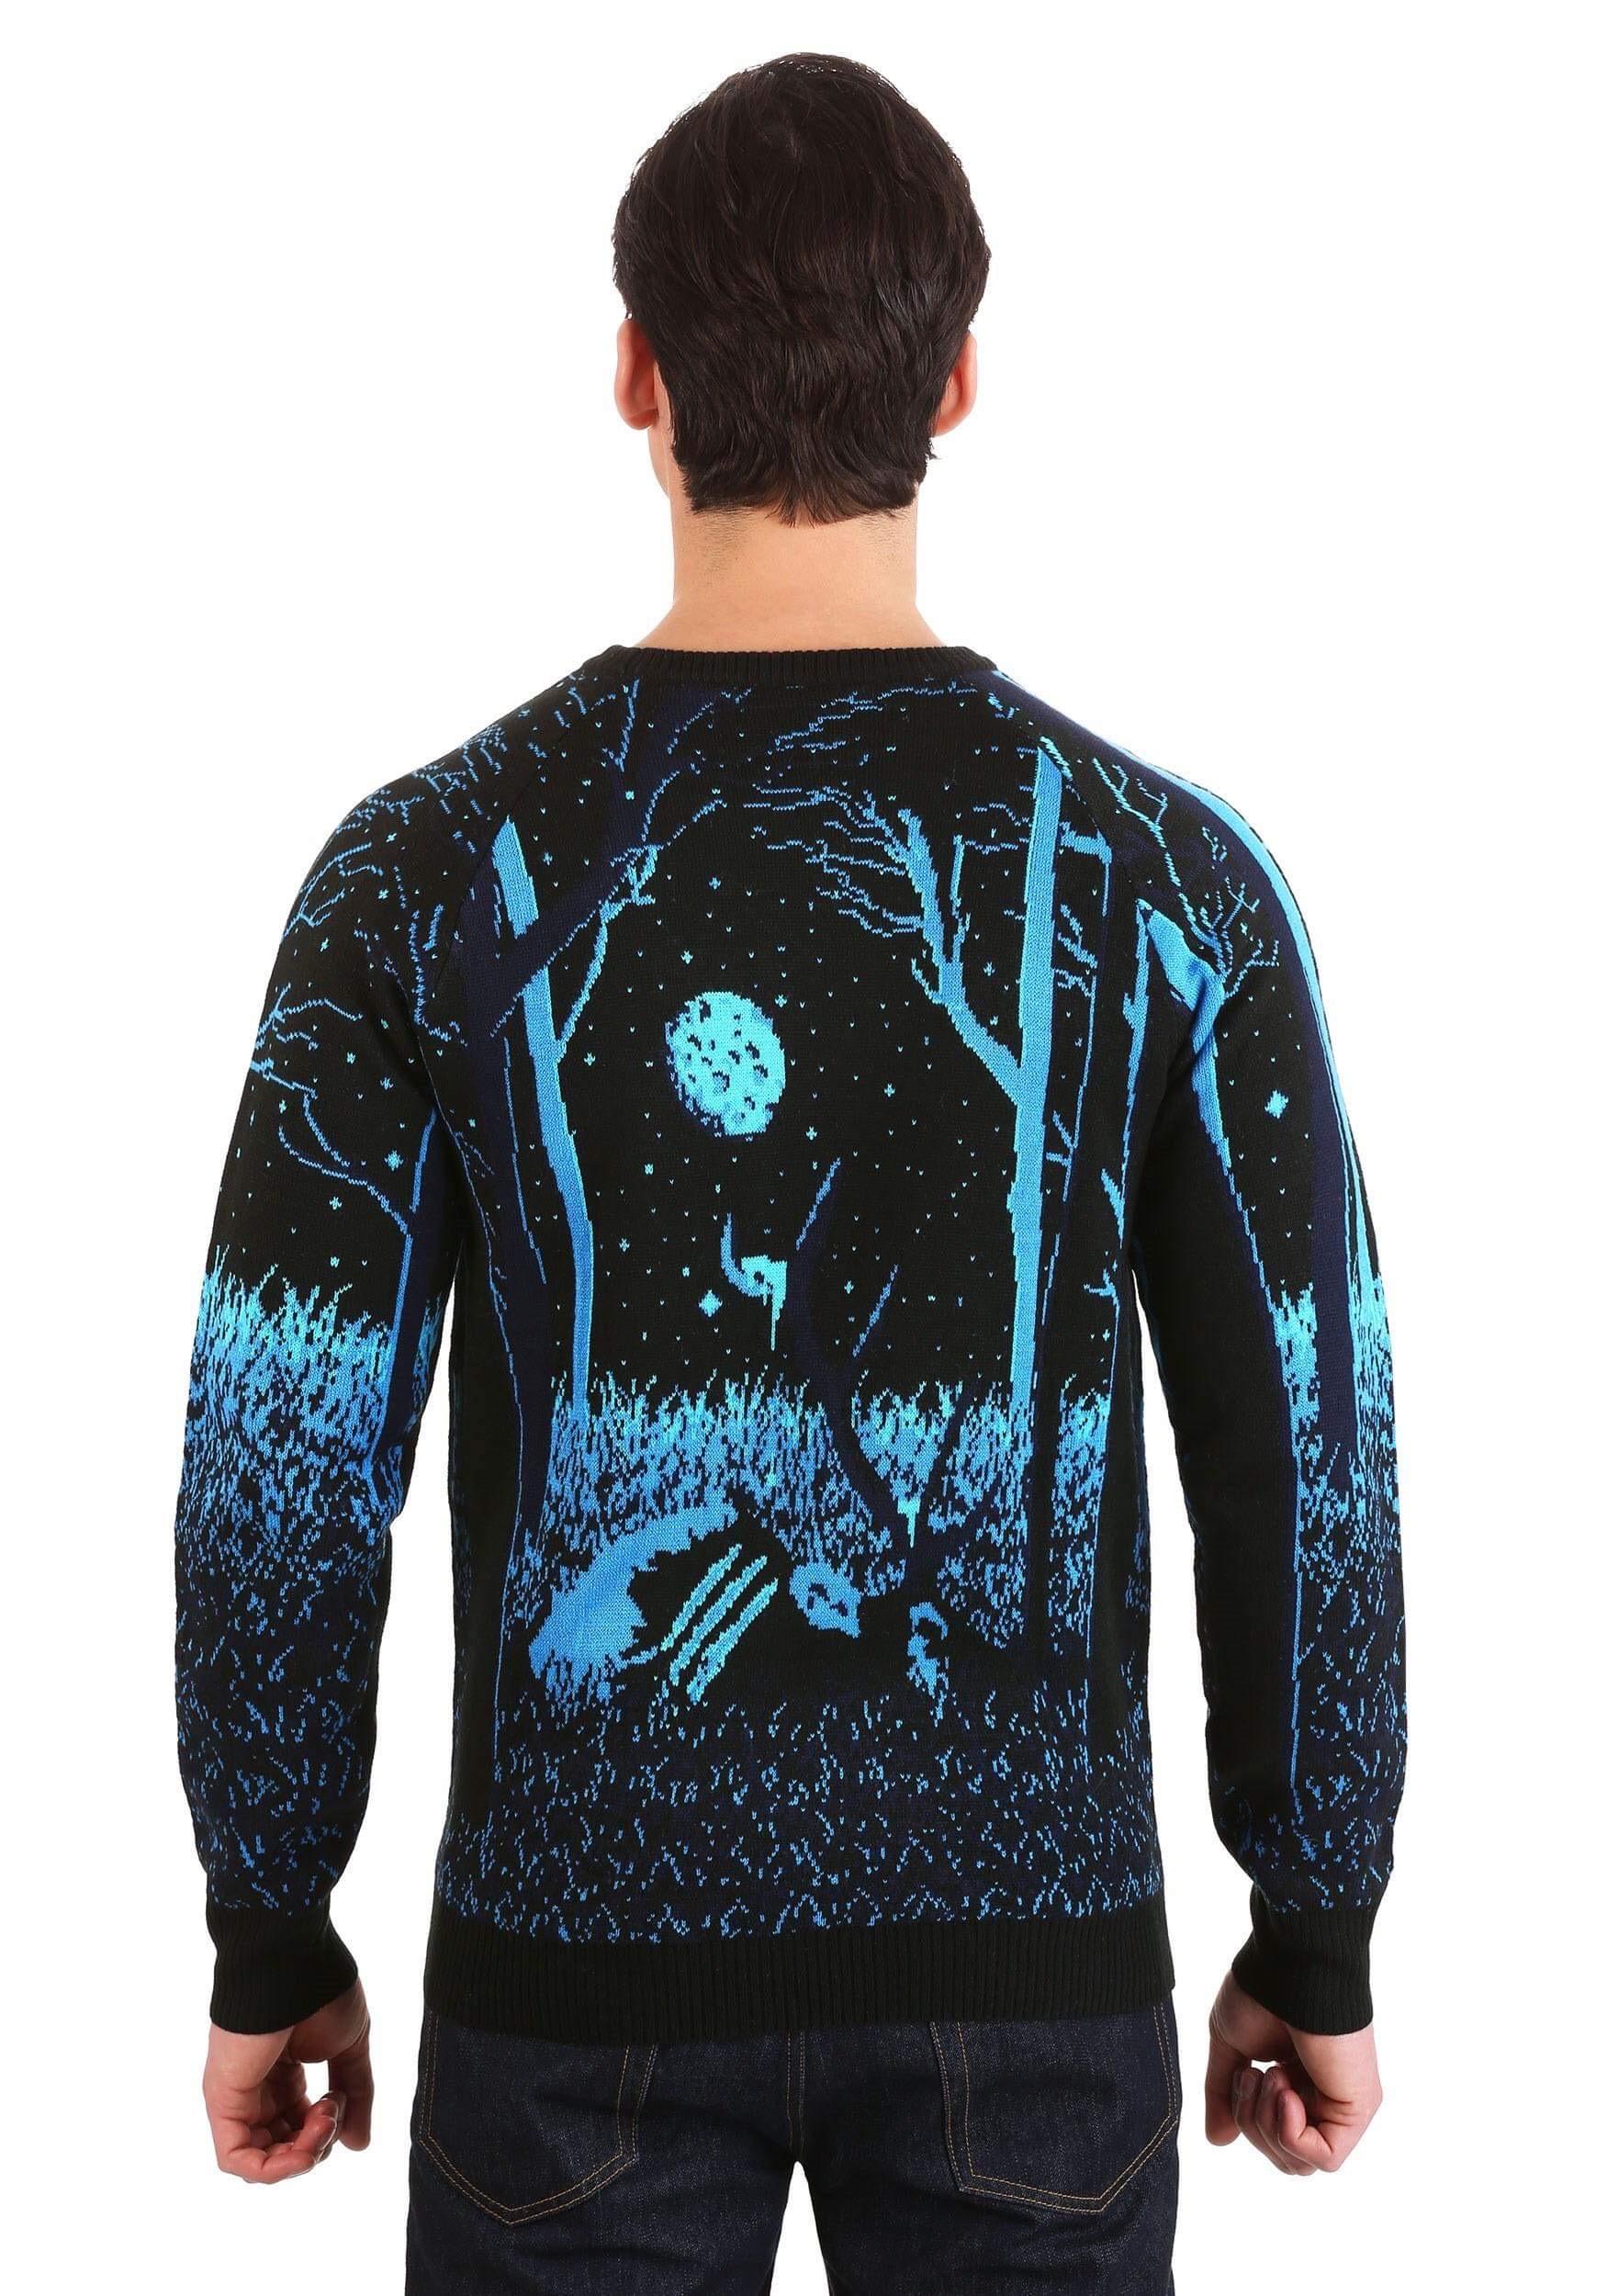 HalloweenCostumes.com sweater